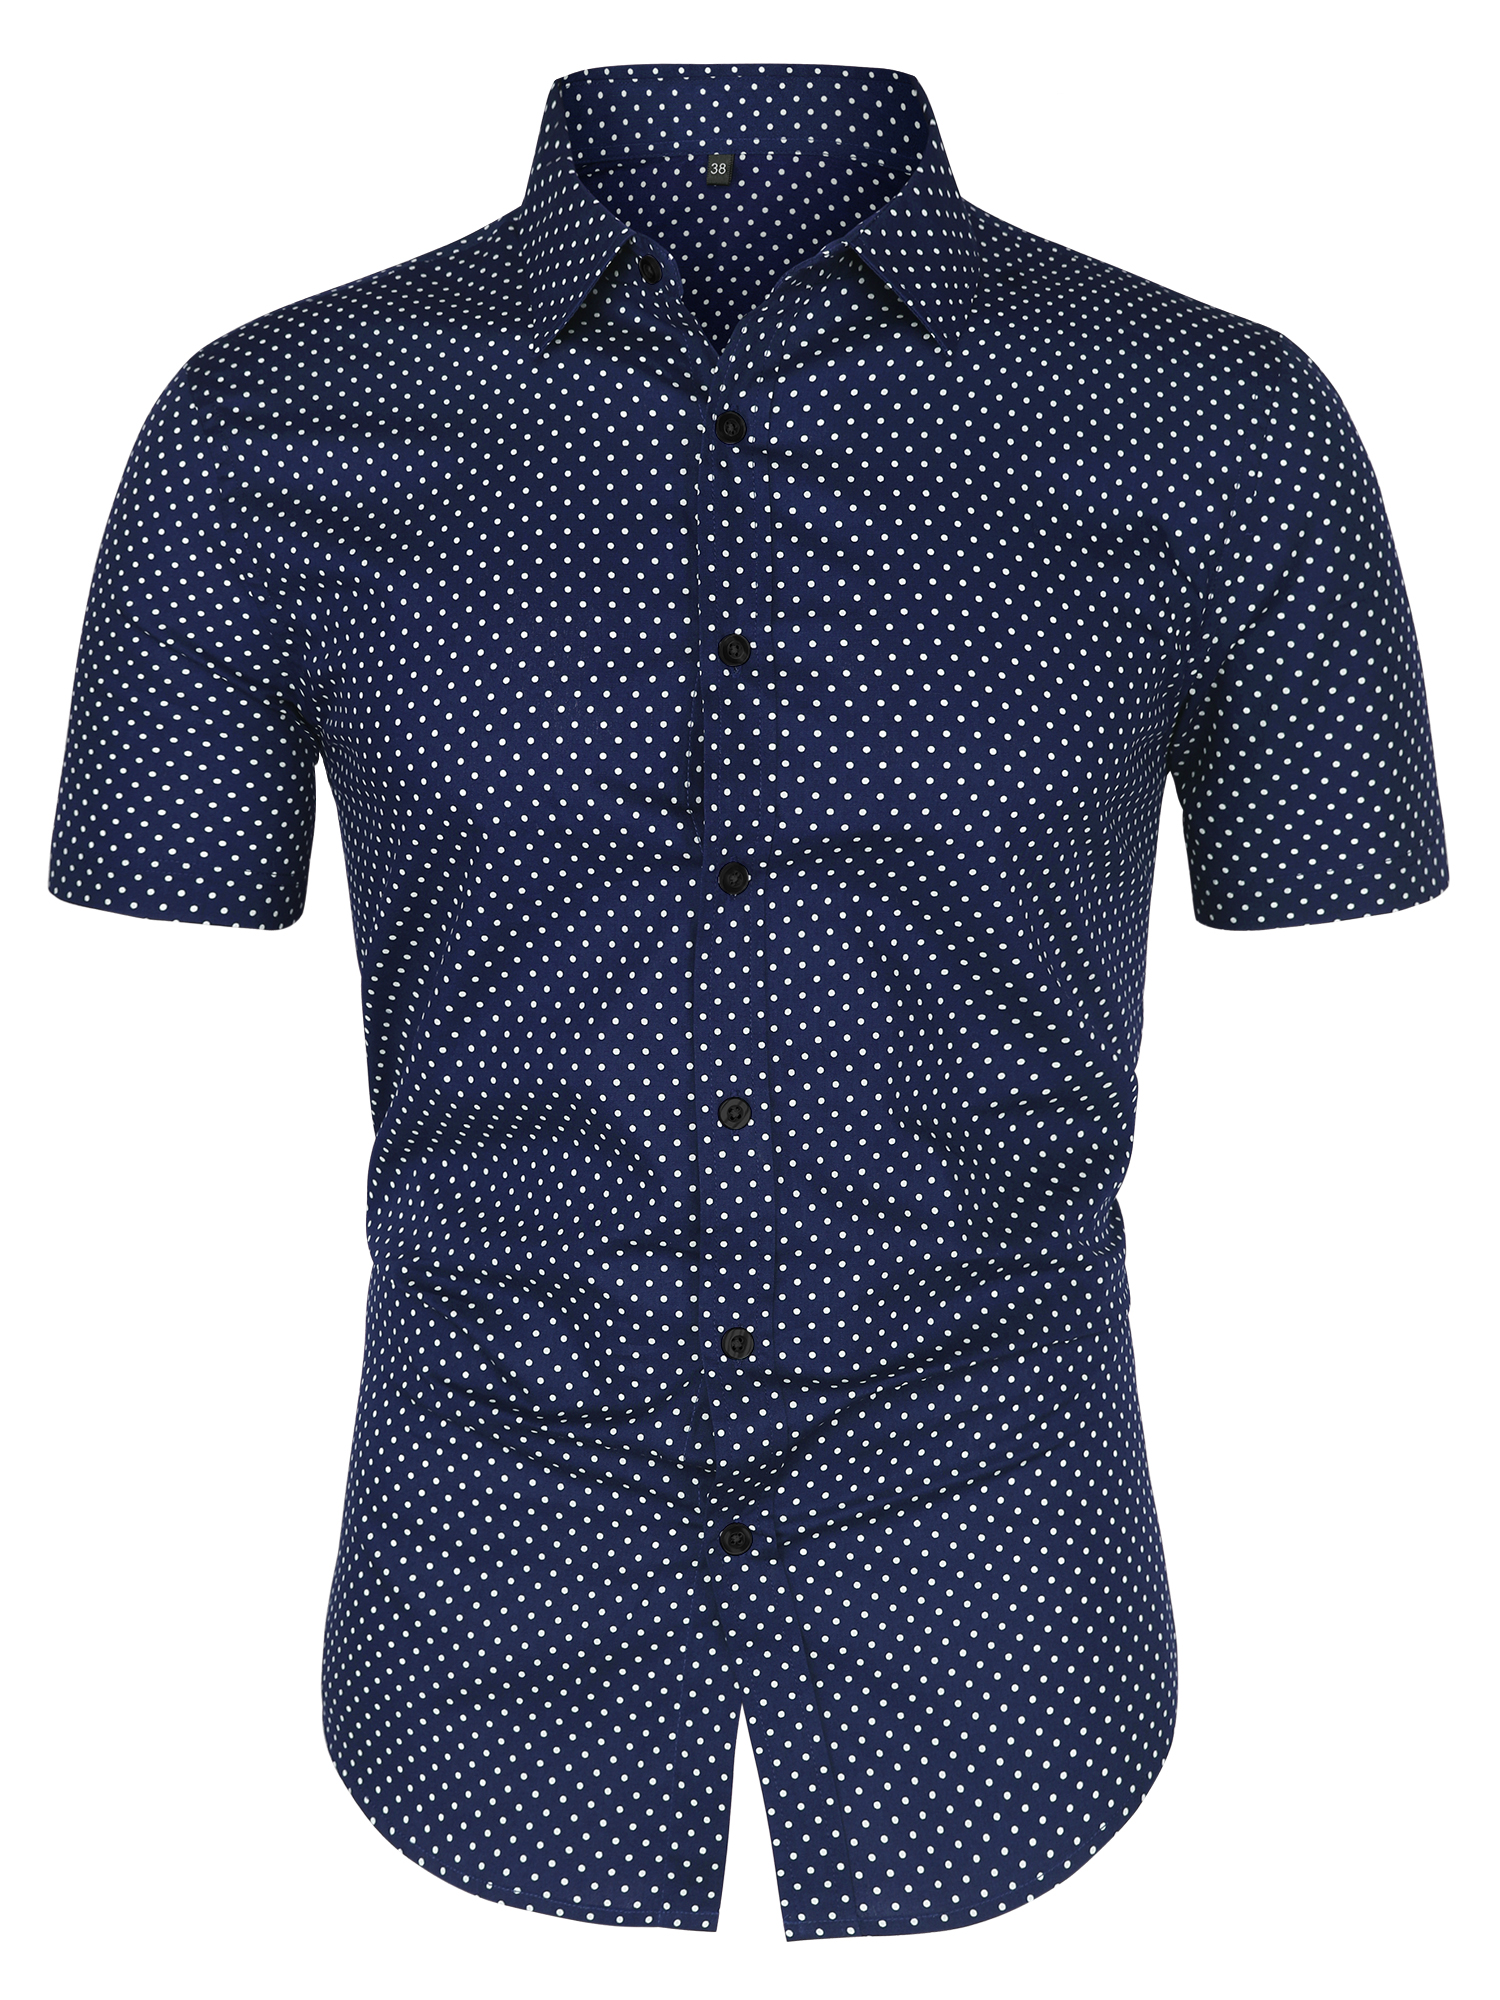 Men Short Sleeves Button Up Cotton Polka Dots Shirt Blue L